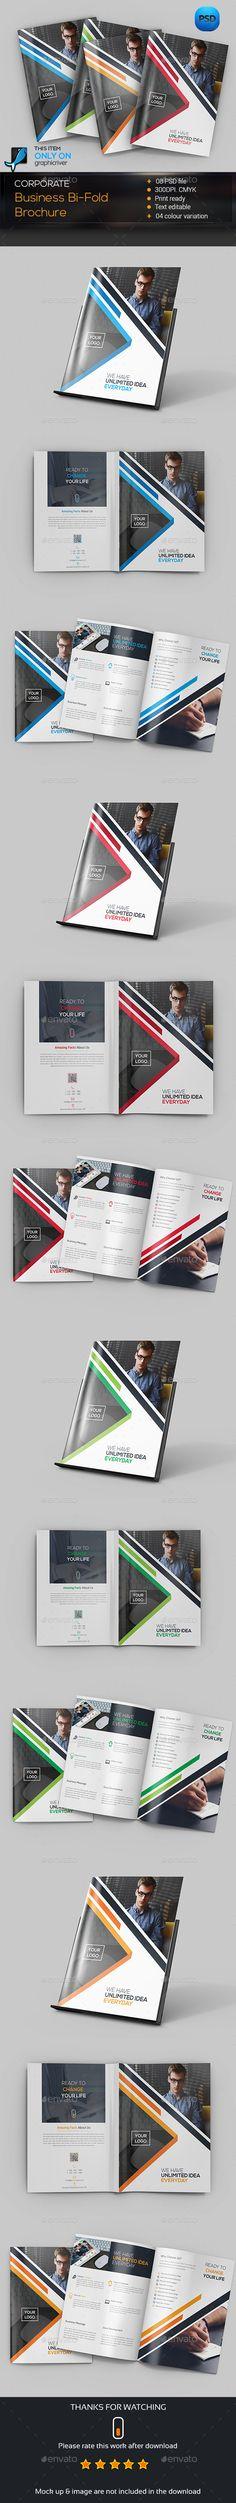 Corporate Bifold Brochure Template PSD #design Download: http://graphicriver.net/item/corporate-bifold-brochure/14258242?ref=ksioks